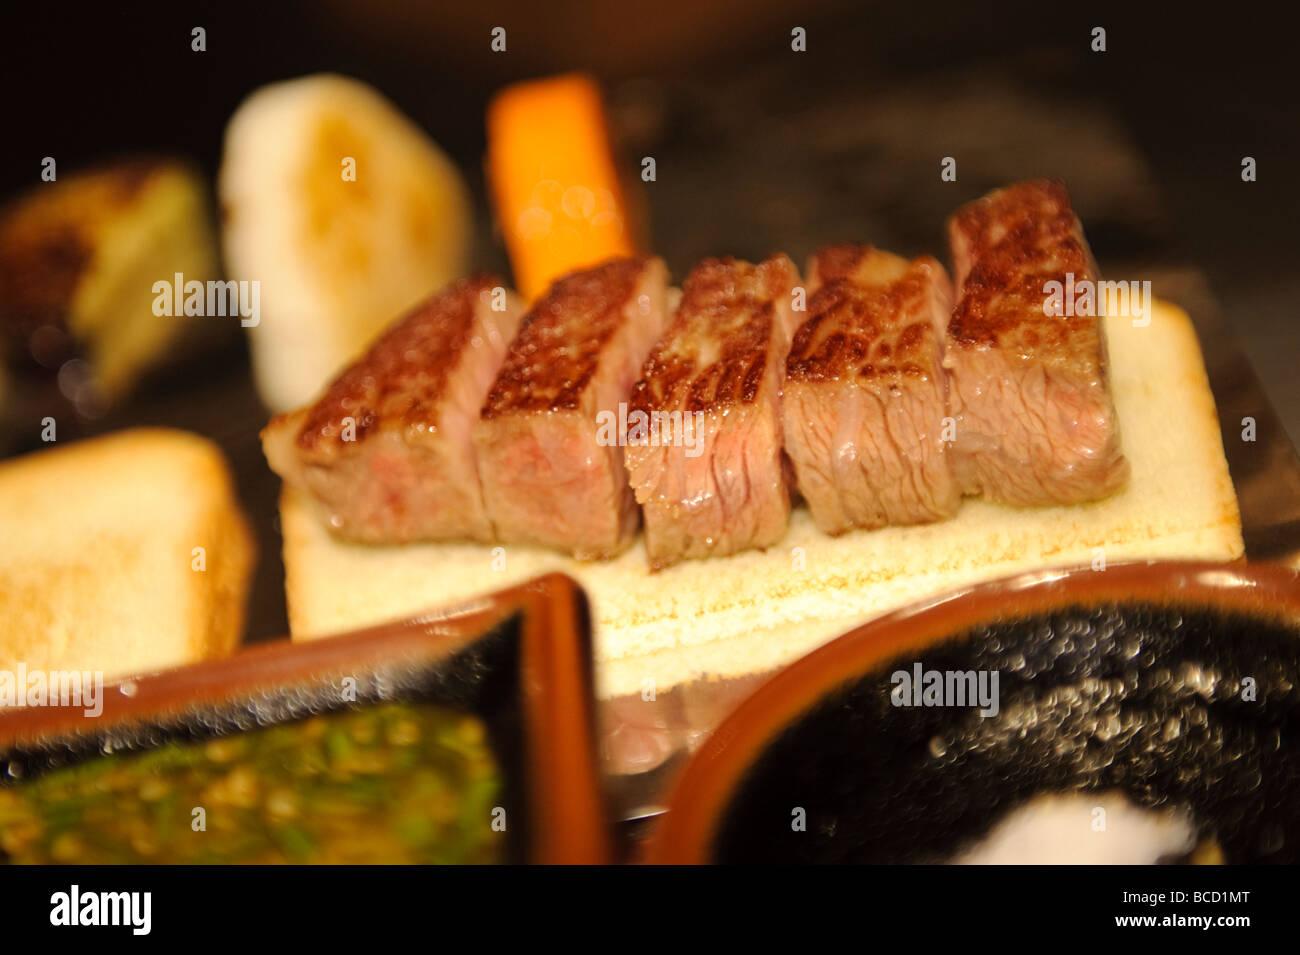 Kobe beef steak Kobe Beef Bifteck Kawamura restaurant, Kobe city, Hyogo Prefecture, Japan, June 25 2009. - Stock Image